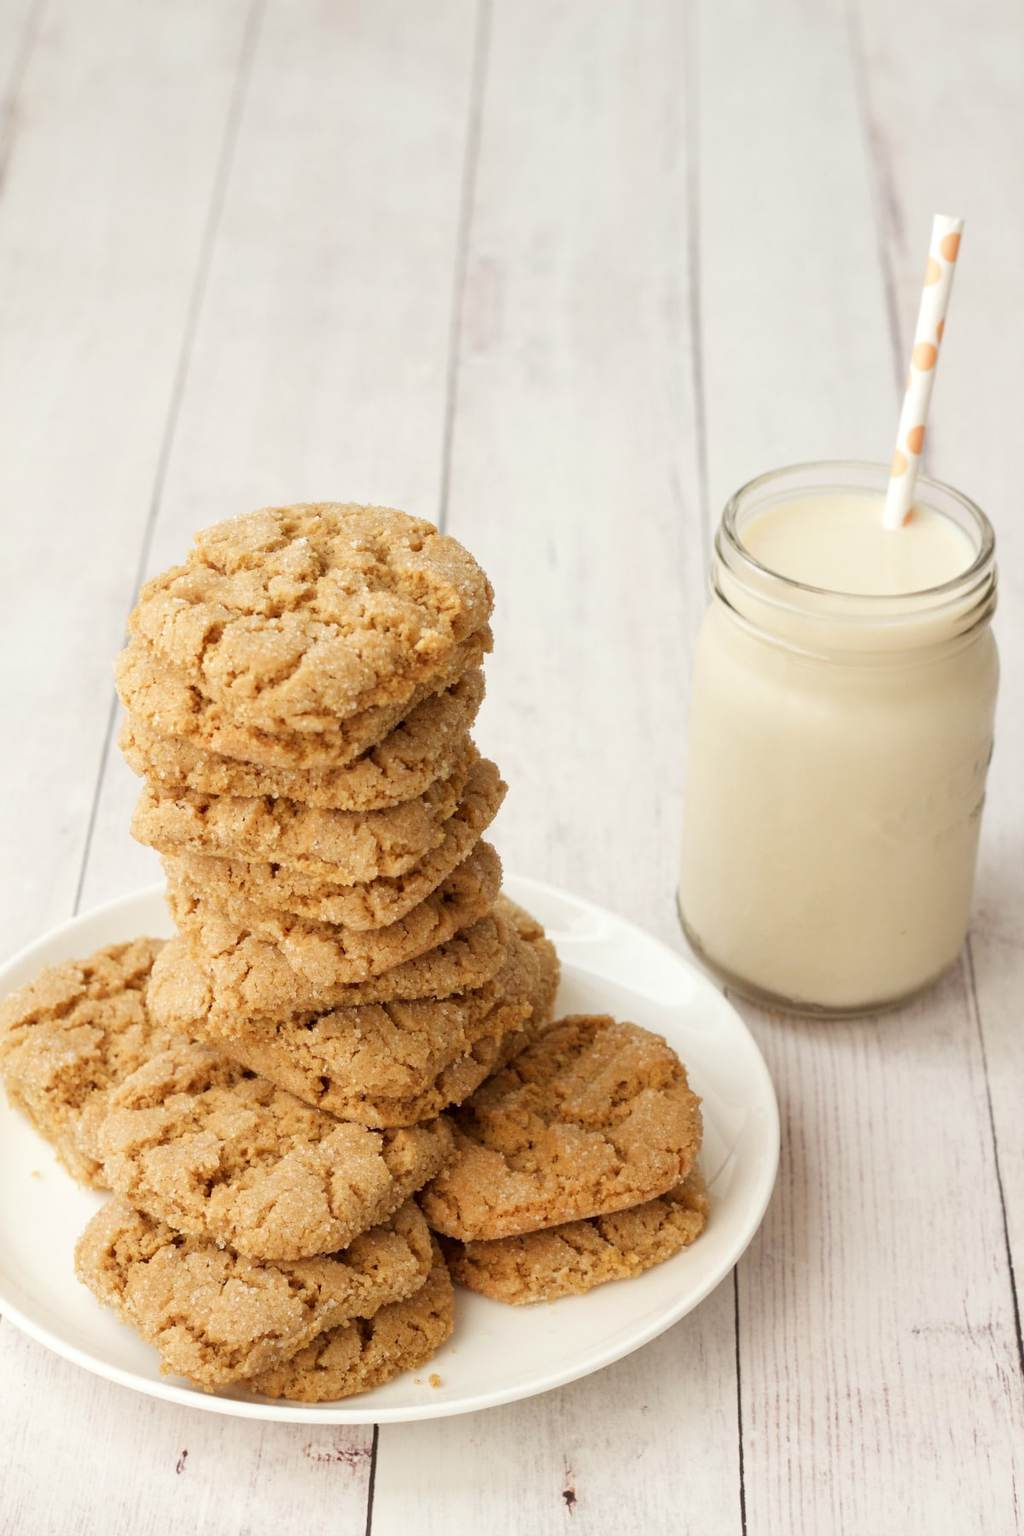 Crunchy Vegan Peanut Butter Cookies